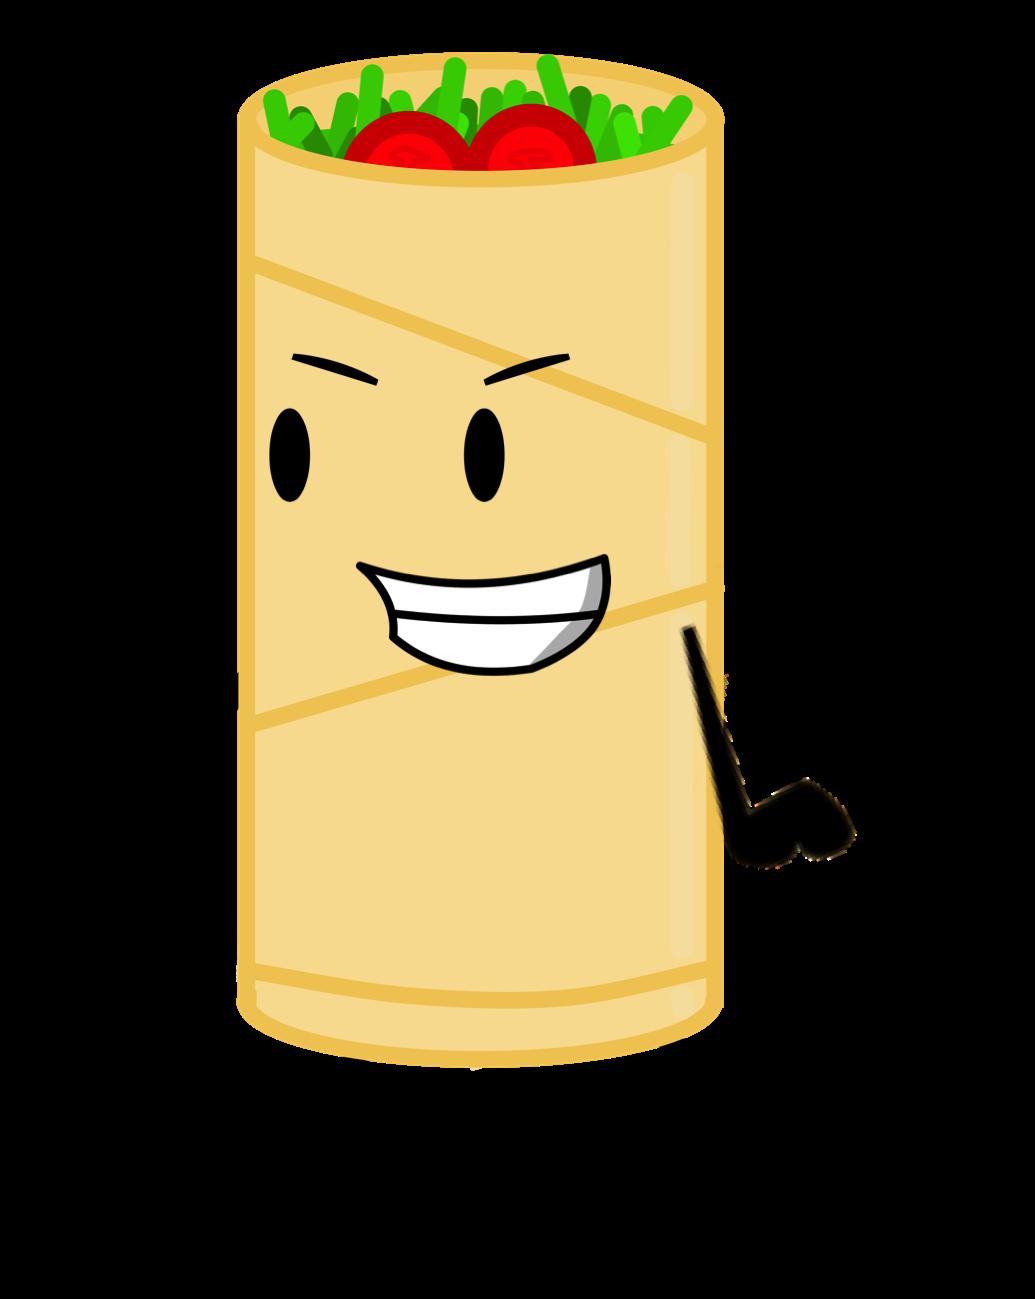 Burrito clipart burrito bowl. Lofty design cultural food